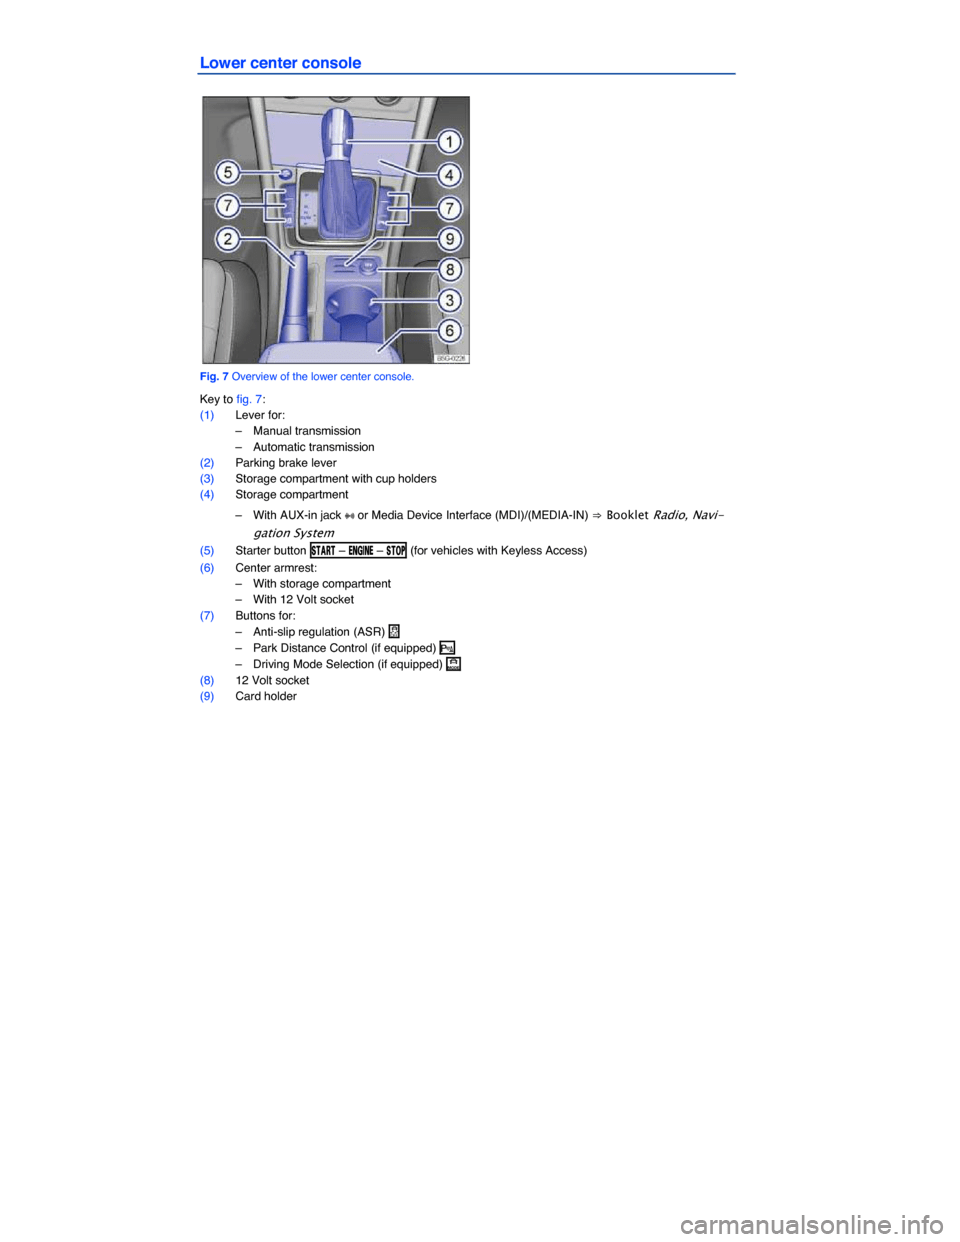 VOLKSWAGEN GOLF GTI 2015 5G / 7.G Owners Manual